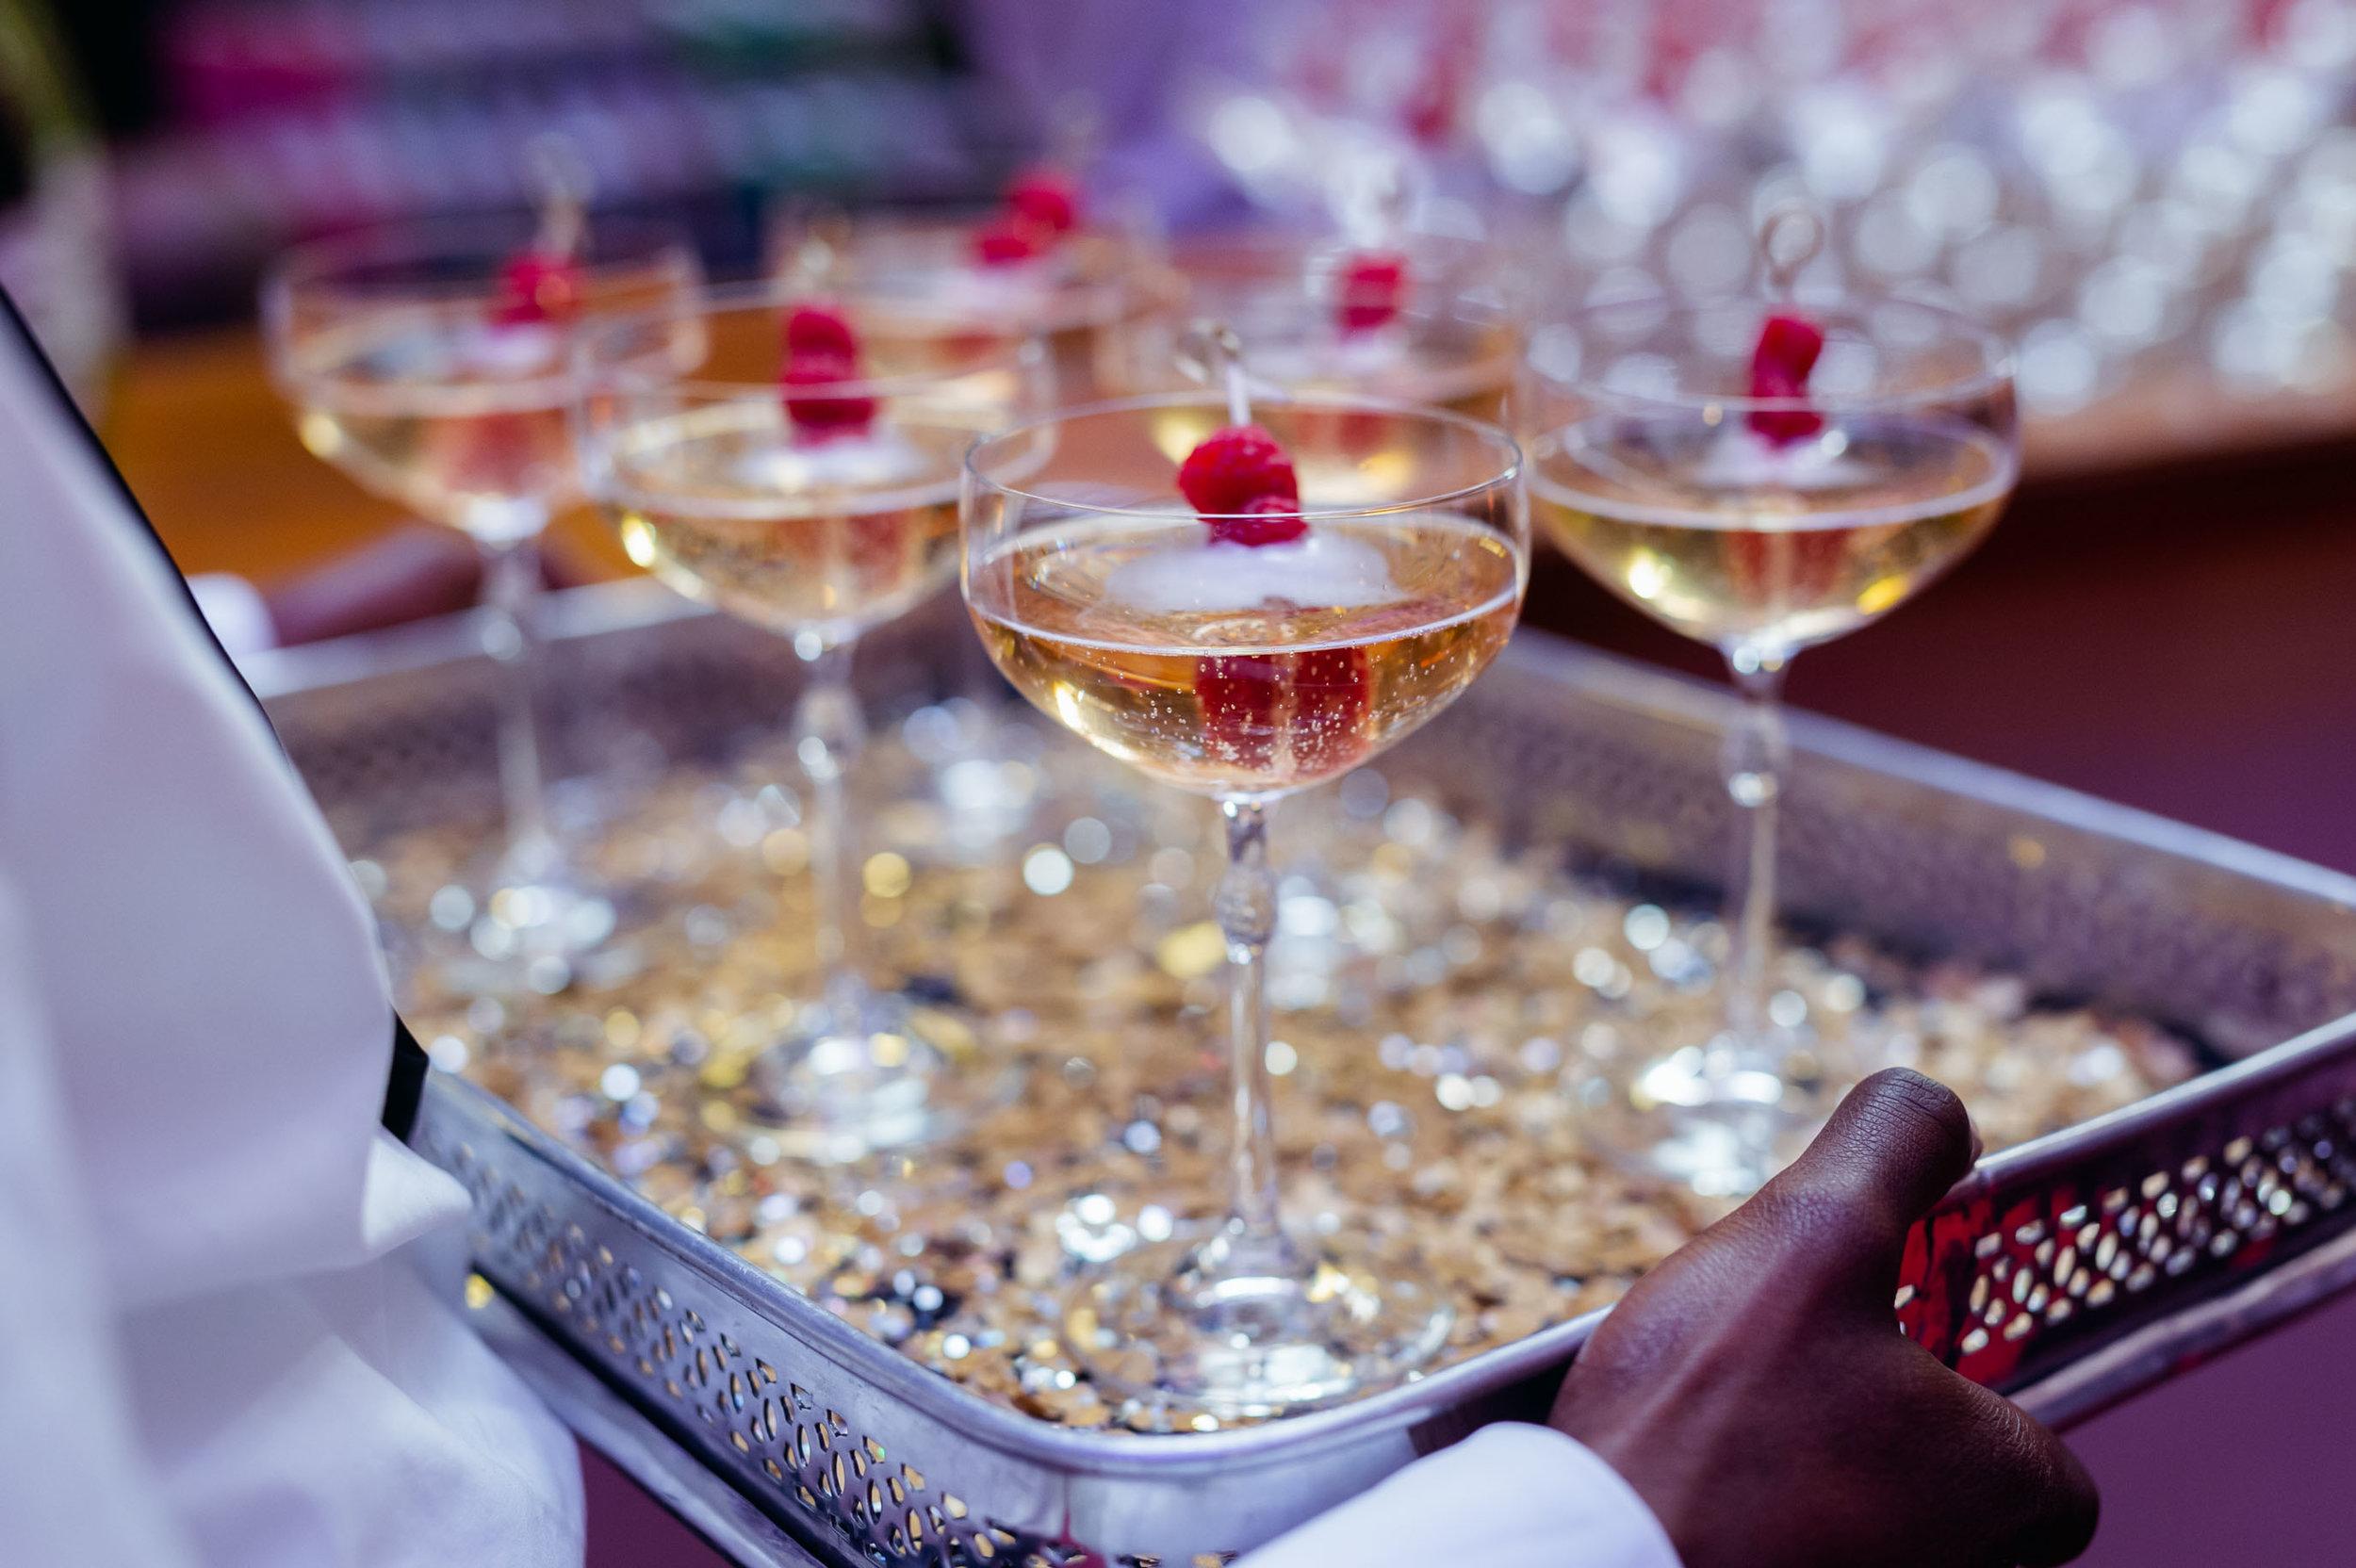 john-henry-wedding-photographer-pre-drinks001-3.jpg